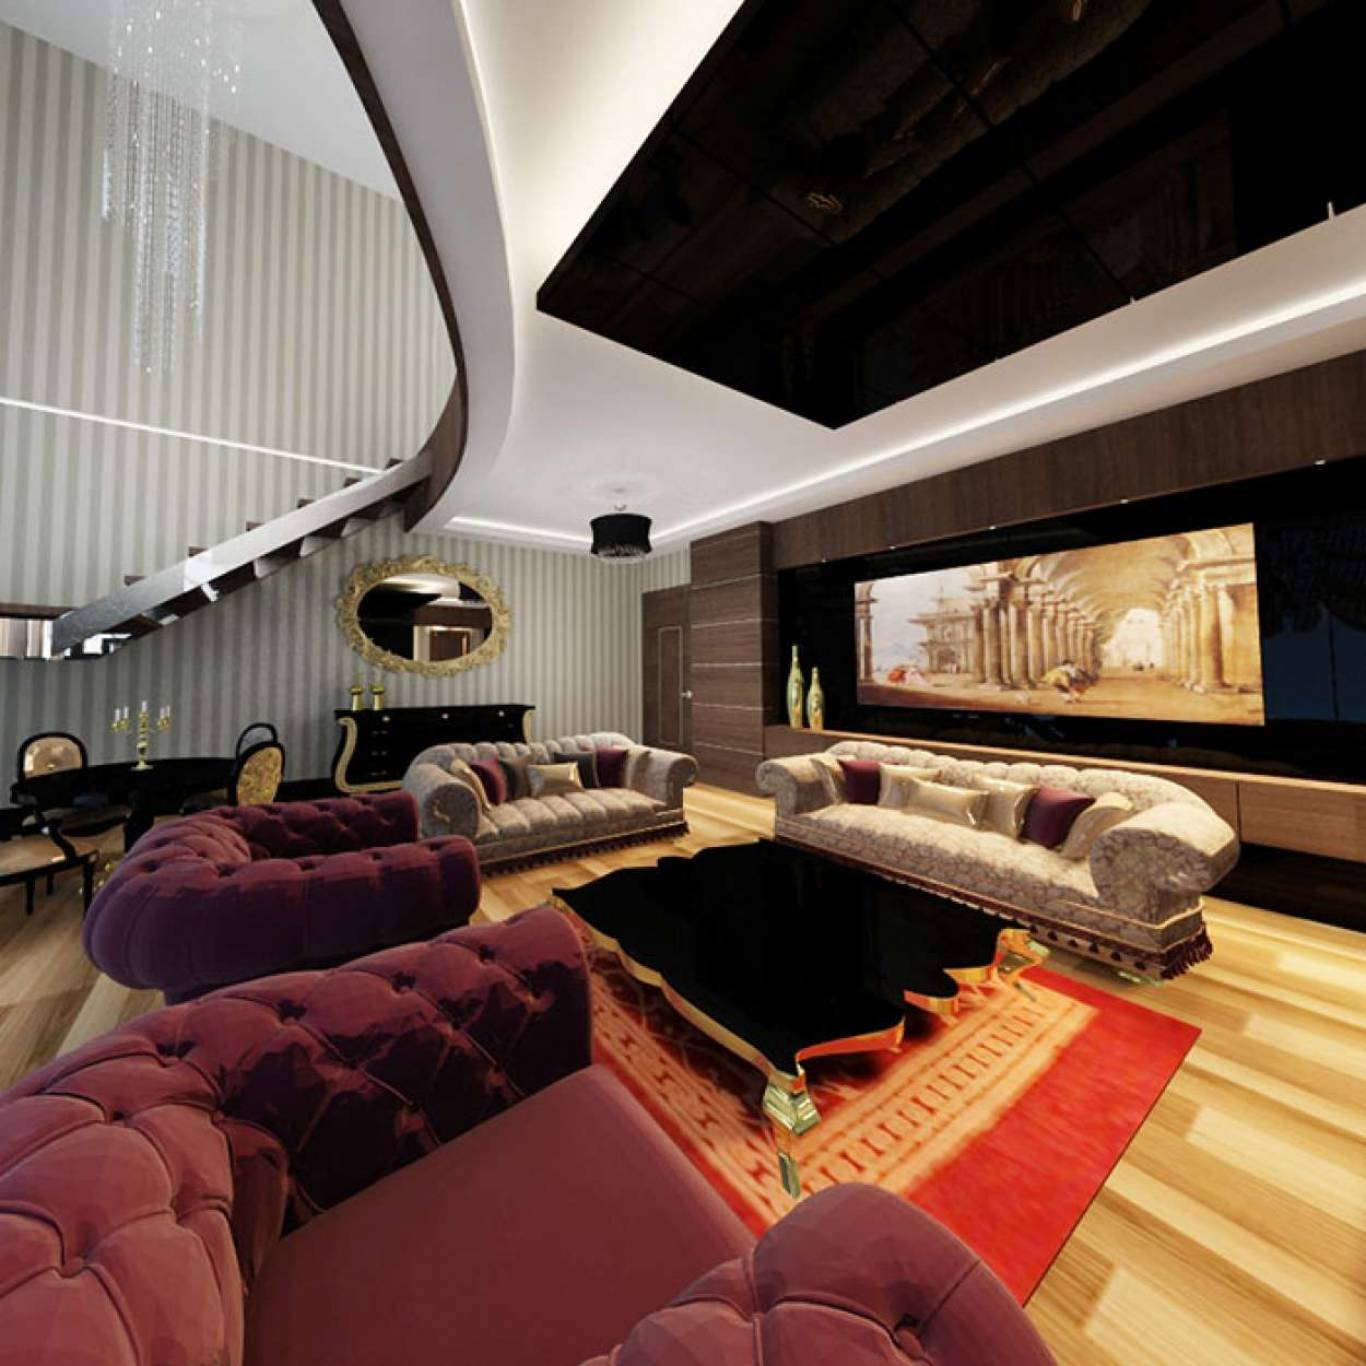 Akrones Termal Hotel - Comparer Les Prix Halalhotelcheck avec Salon De Jardin Design Luxe